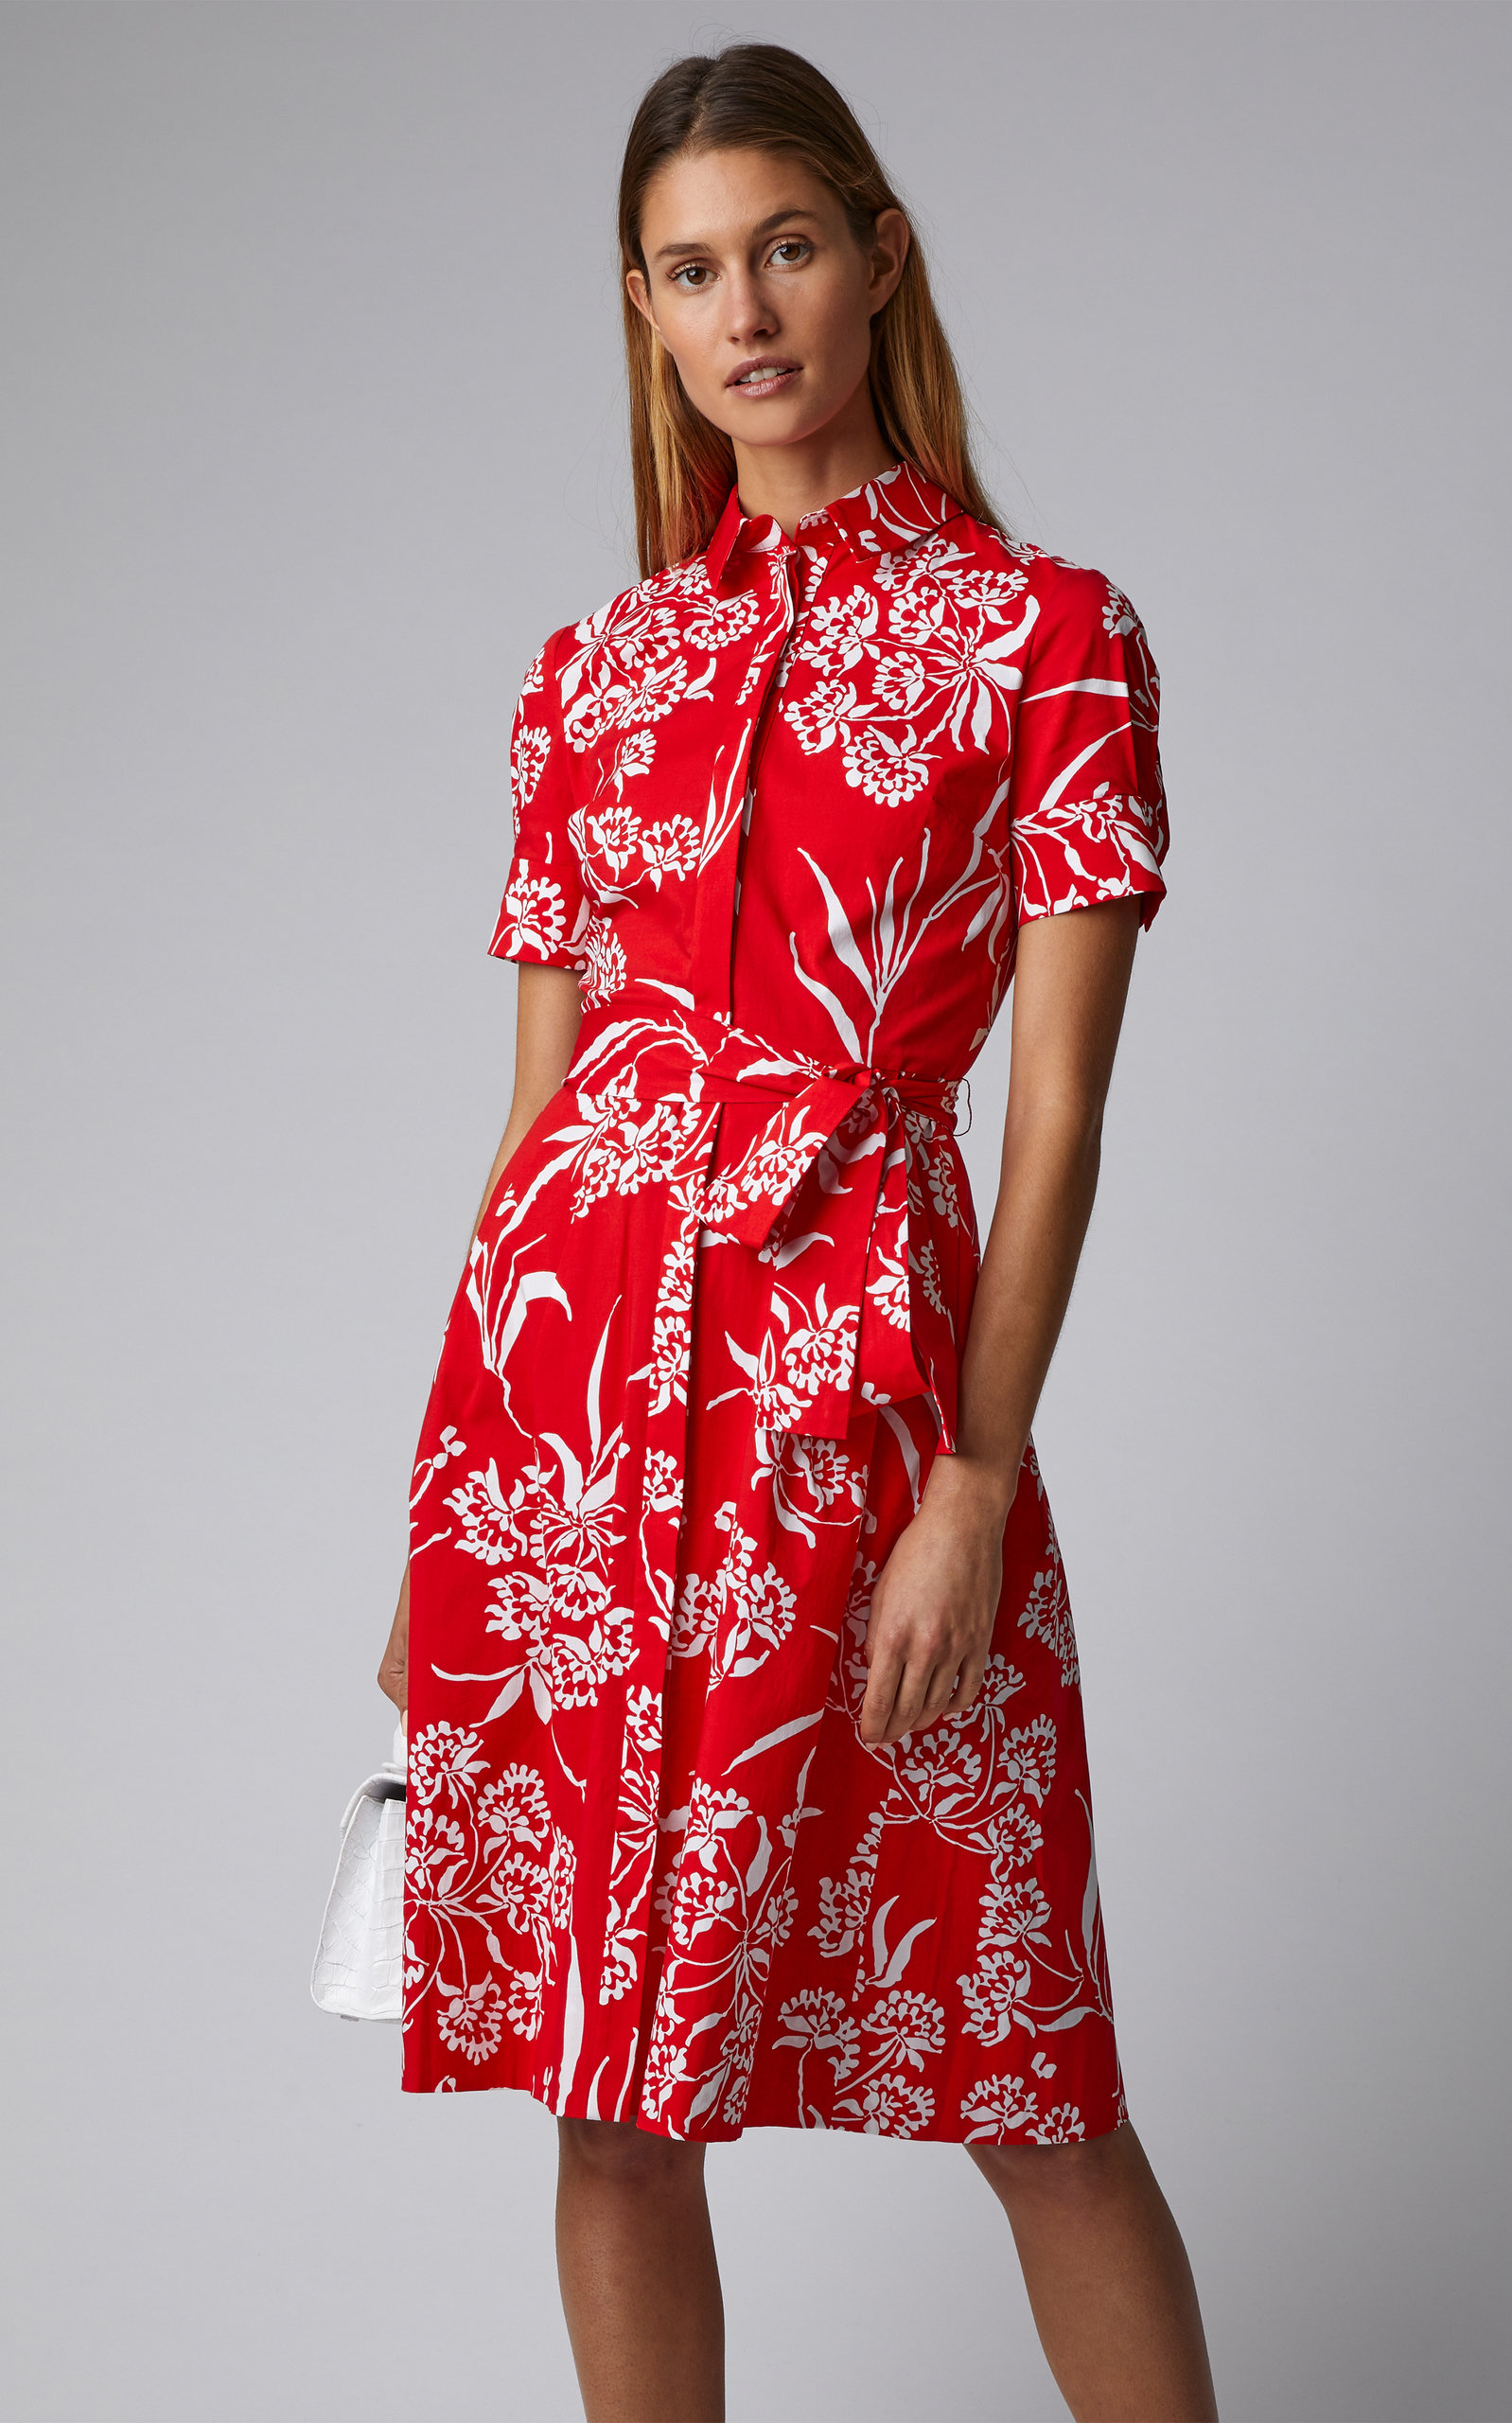 Floral Cotton Poplin Shirt Dress By Carolina Herrera Moda Operandi